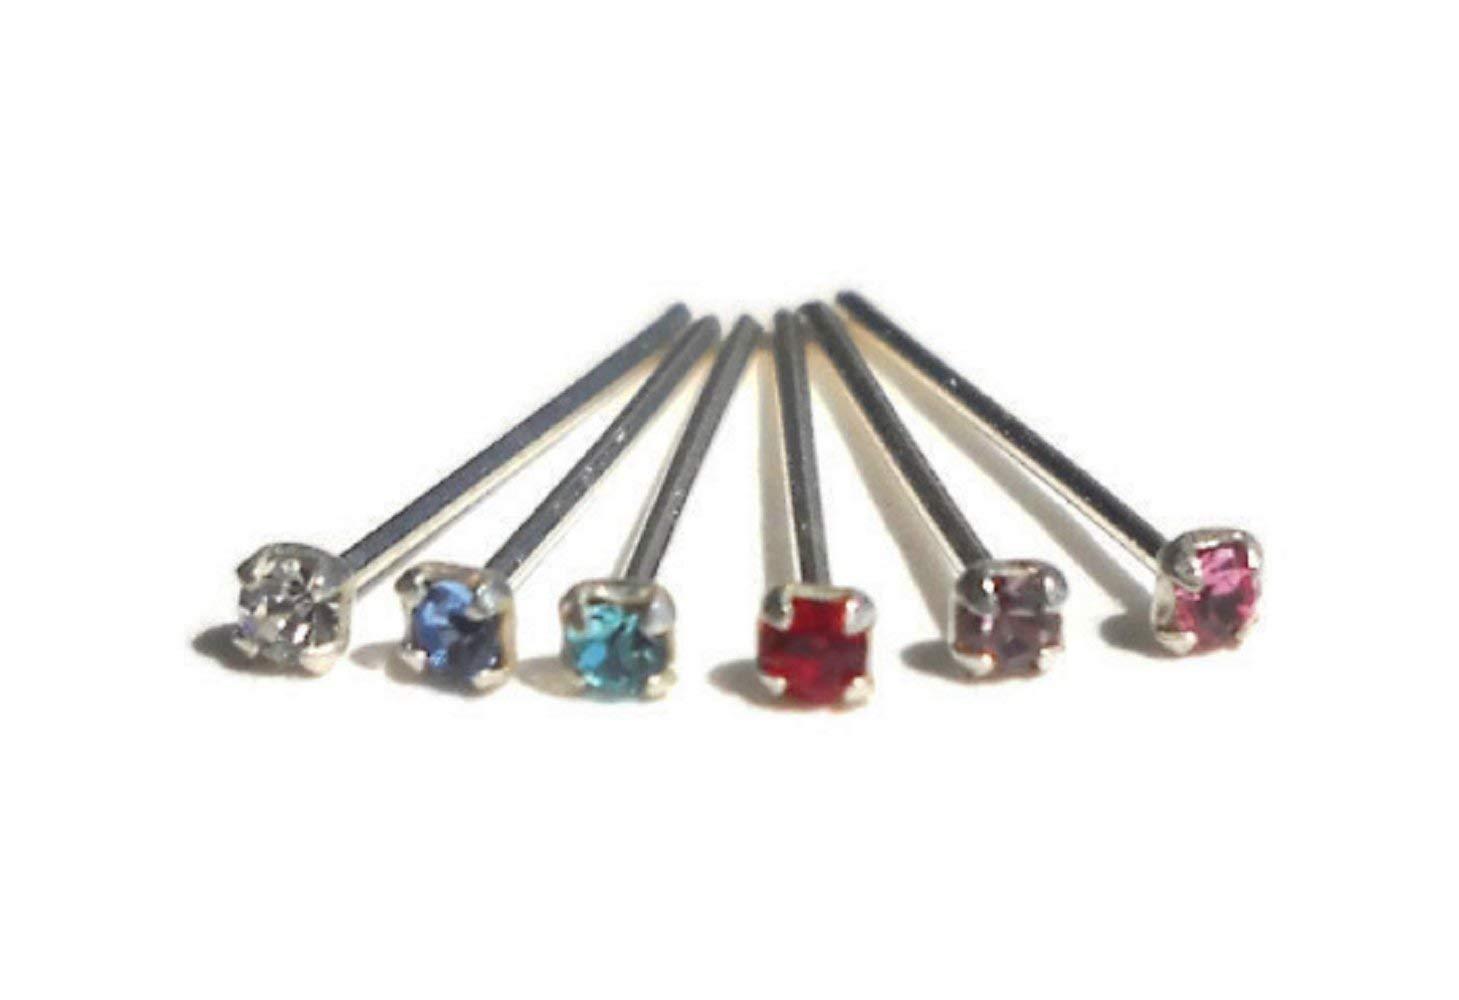 925 Sterling Silver Clear,Pink,Red,Lilac,Aqua,Light Blue,Black,Green Rhinestone Nose Stud 23 Gauge 1.5mm Rhinestone